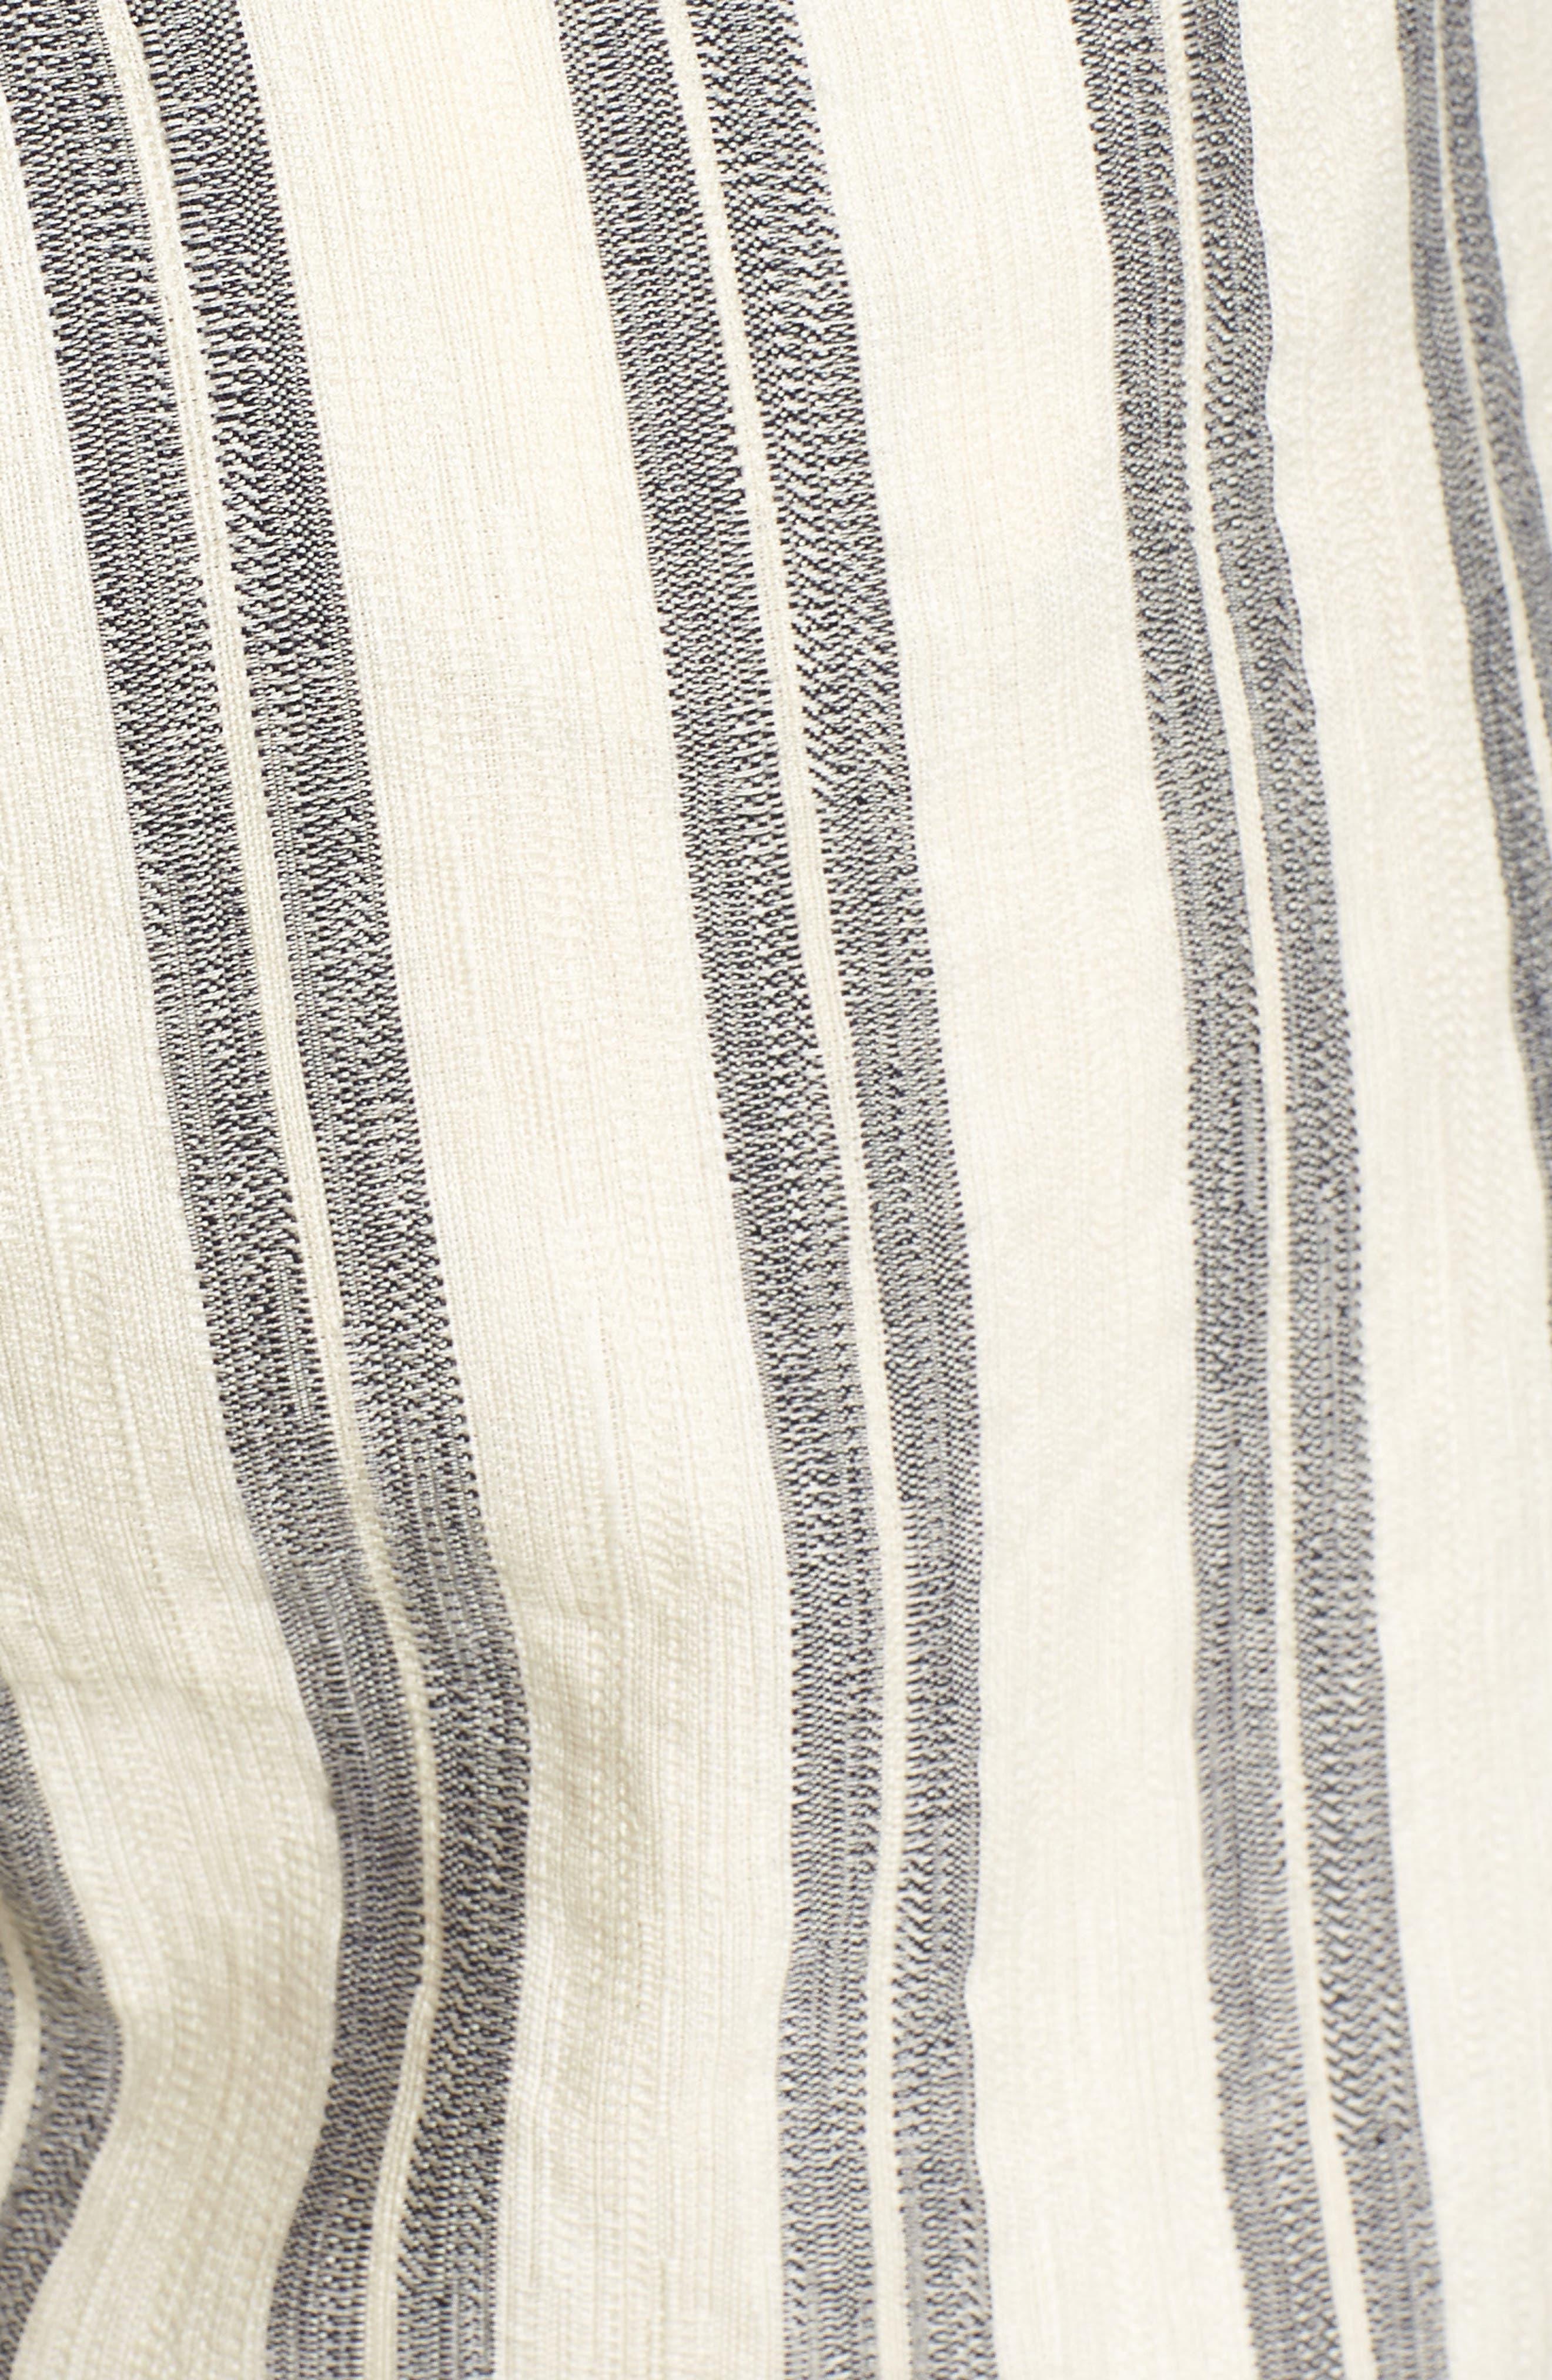 REBECCA MINKOFF,                             Marley Stripe Jumpsuit,                             Alternate thumbnail 6, color,                             102